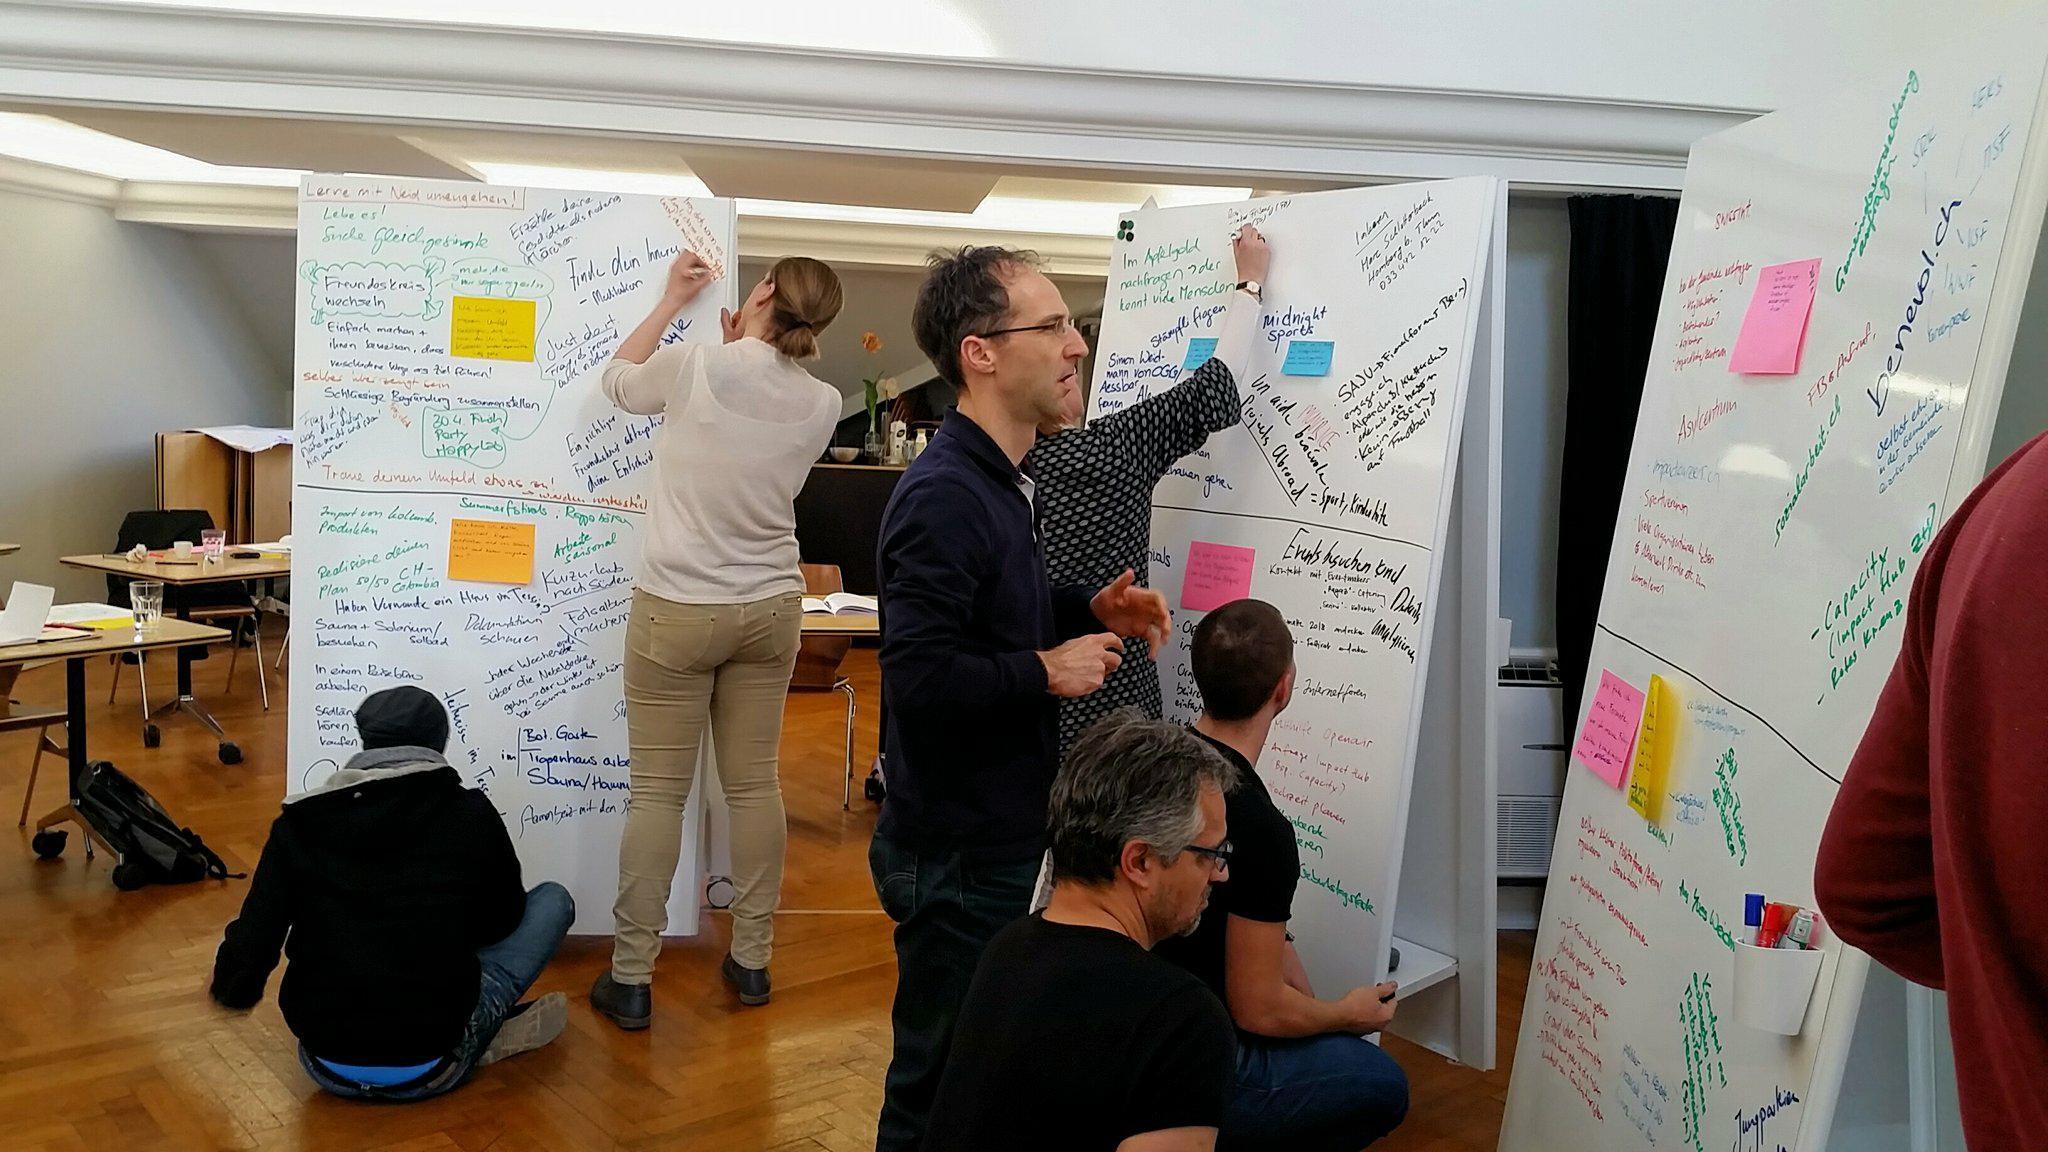 Innovation Beratung Bern